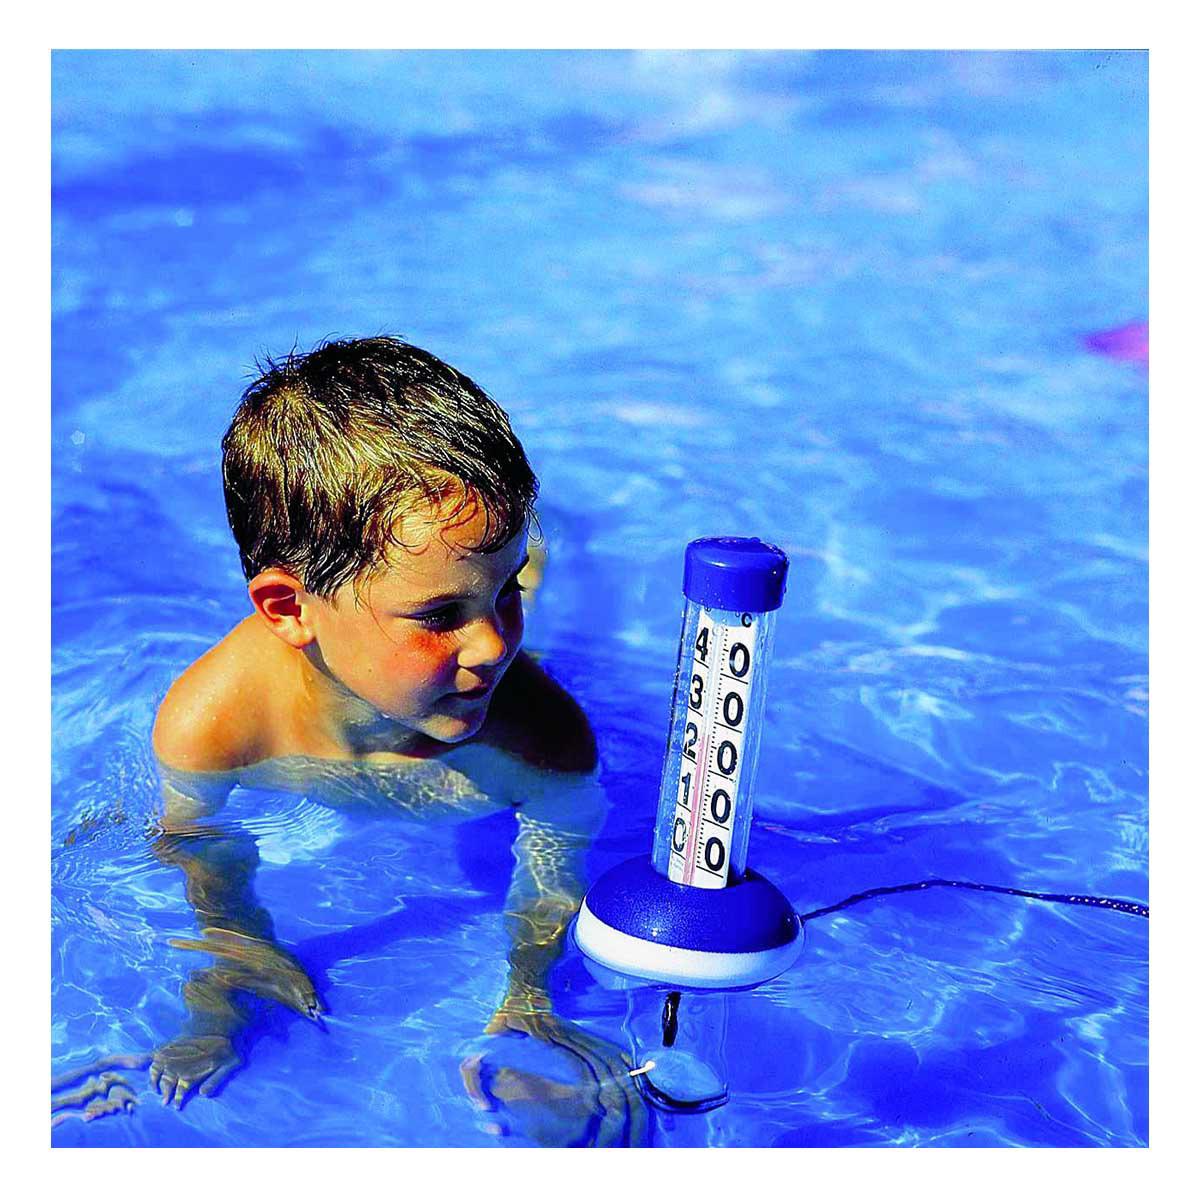 40-2003-analoges-schwimmbadthermometer-neptun-anwendung-1200x1200px.jpg